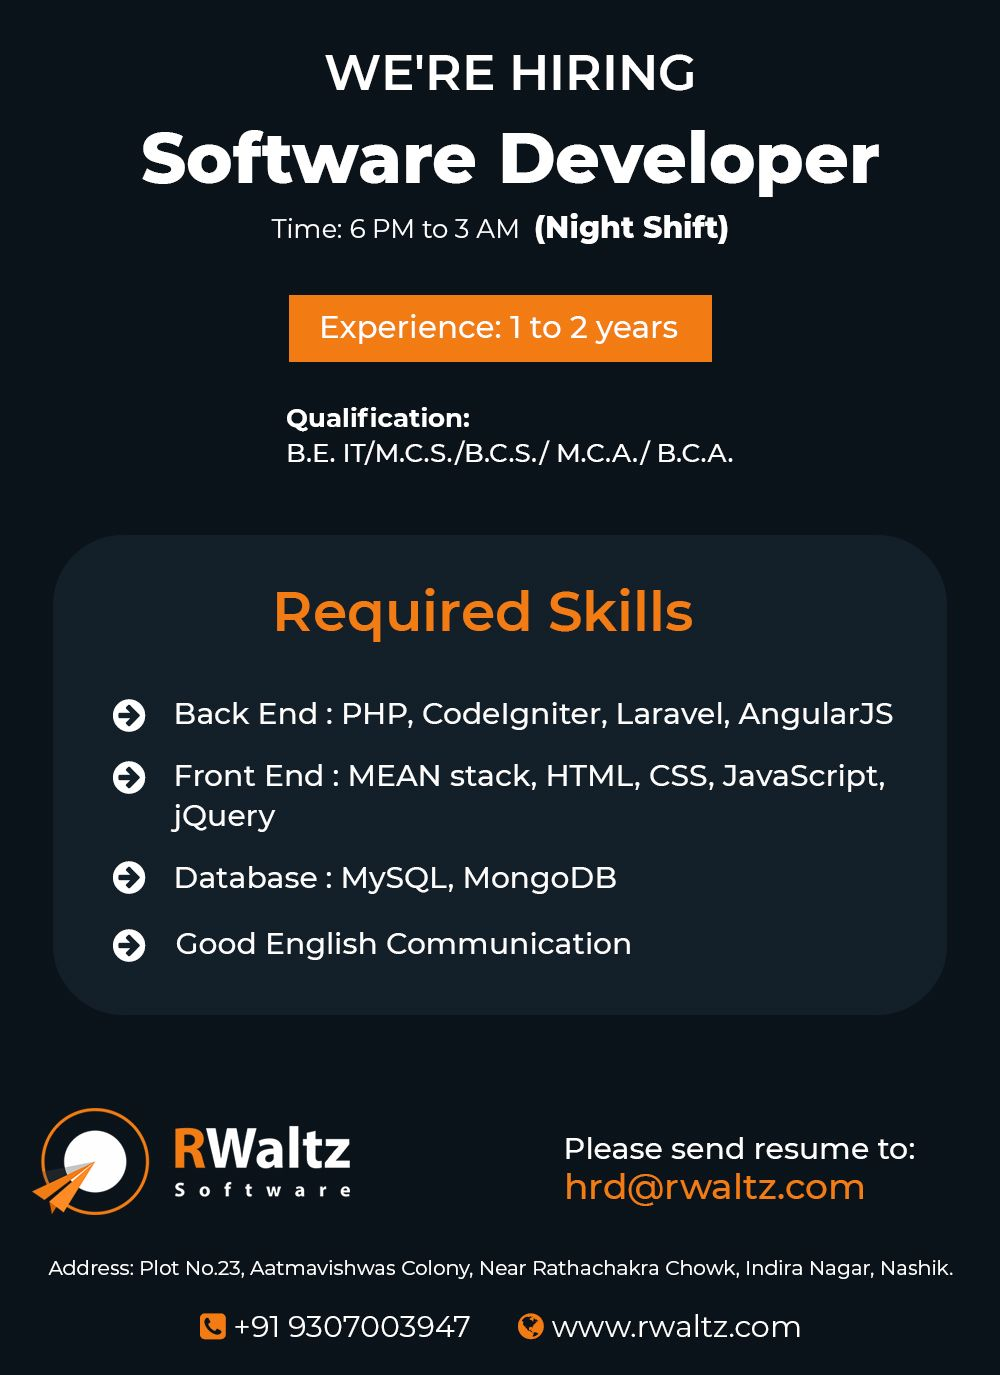 We Are Hiring Software Developer Software Development Resume Software Web Development Company